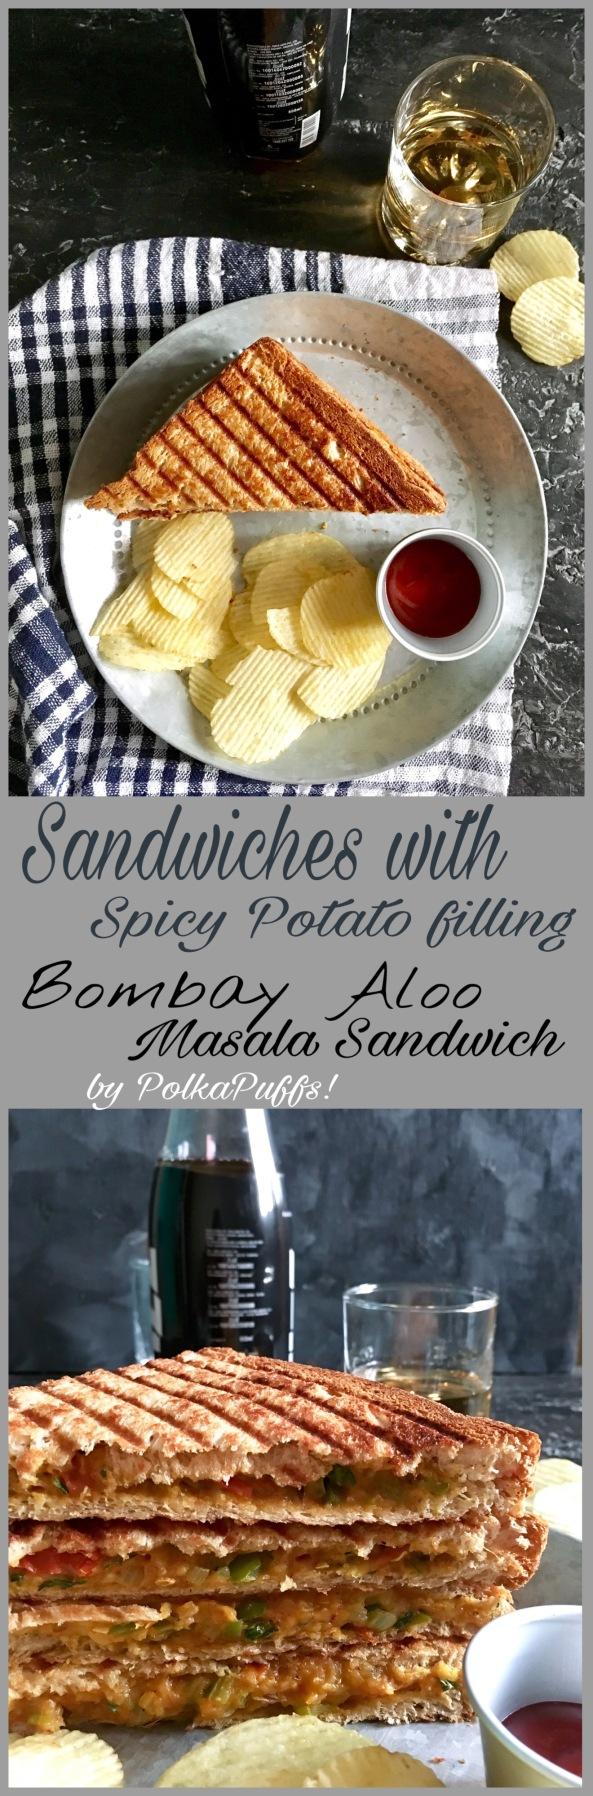 Sandwiches with Spicy Potato fillng   Bombay Masala Aloo Sandwich   PolkaPuffs